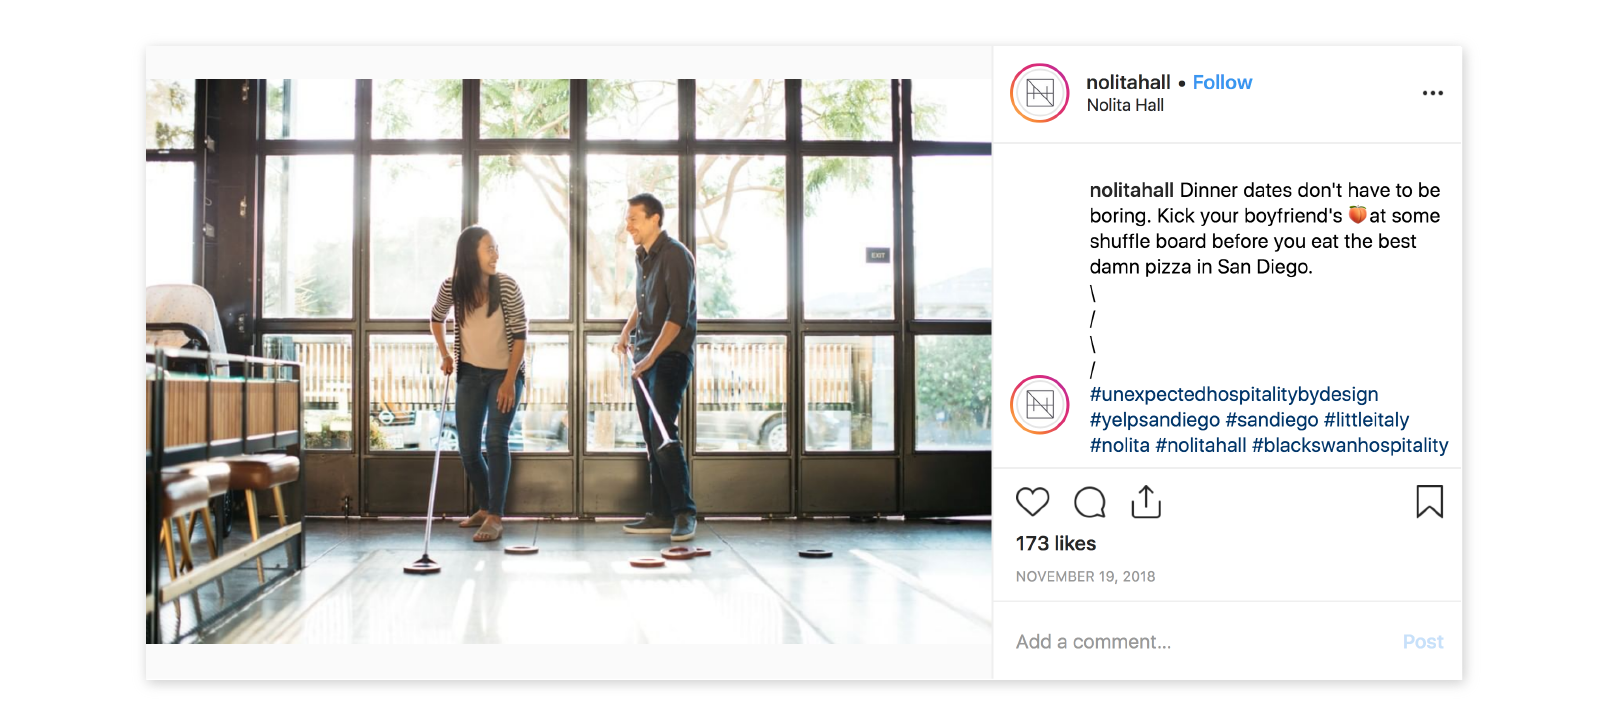 nolita hall shuffle board instagram photo